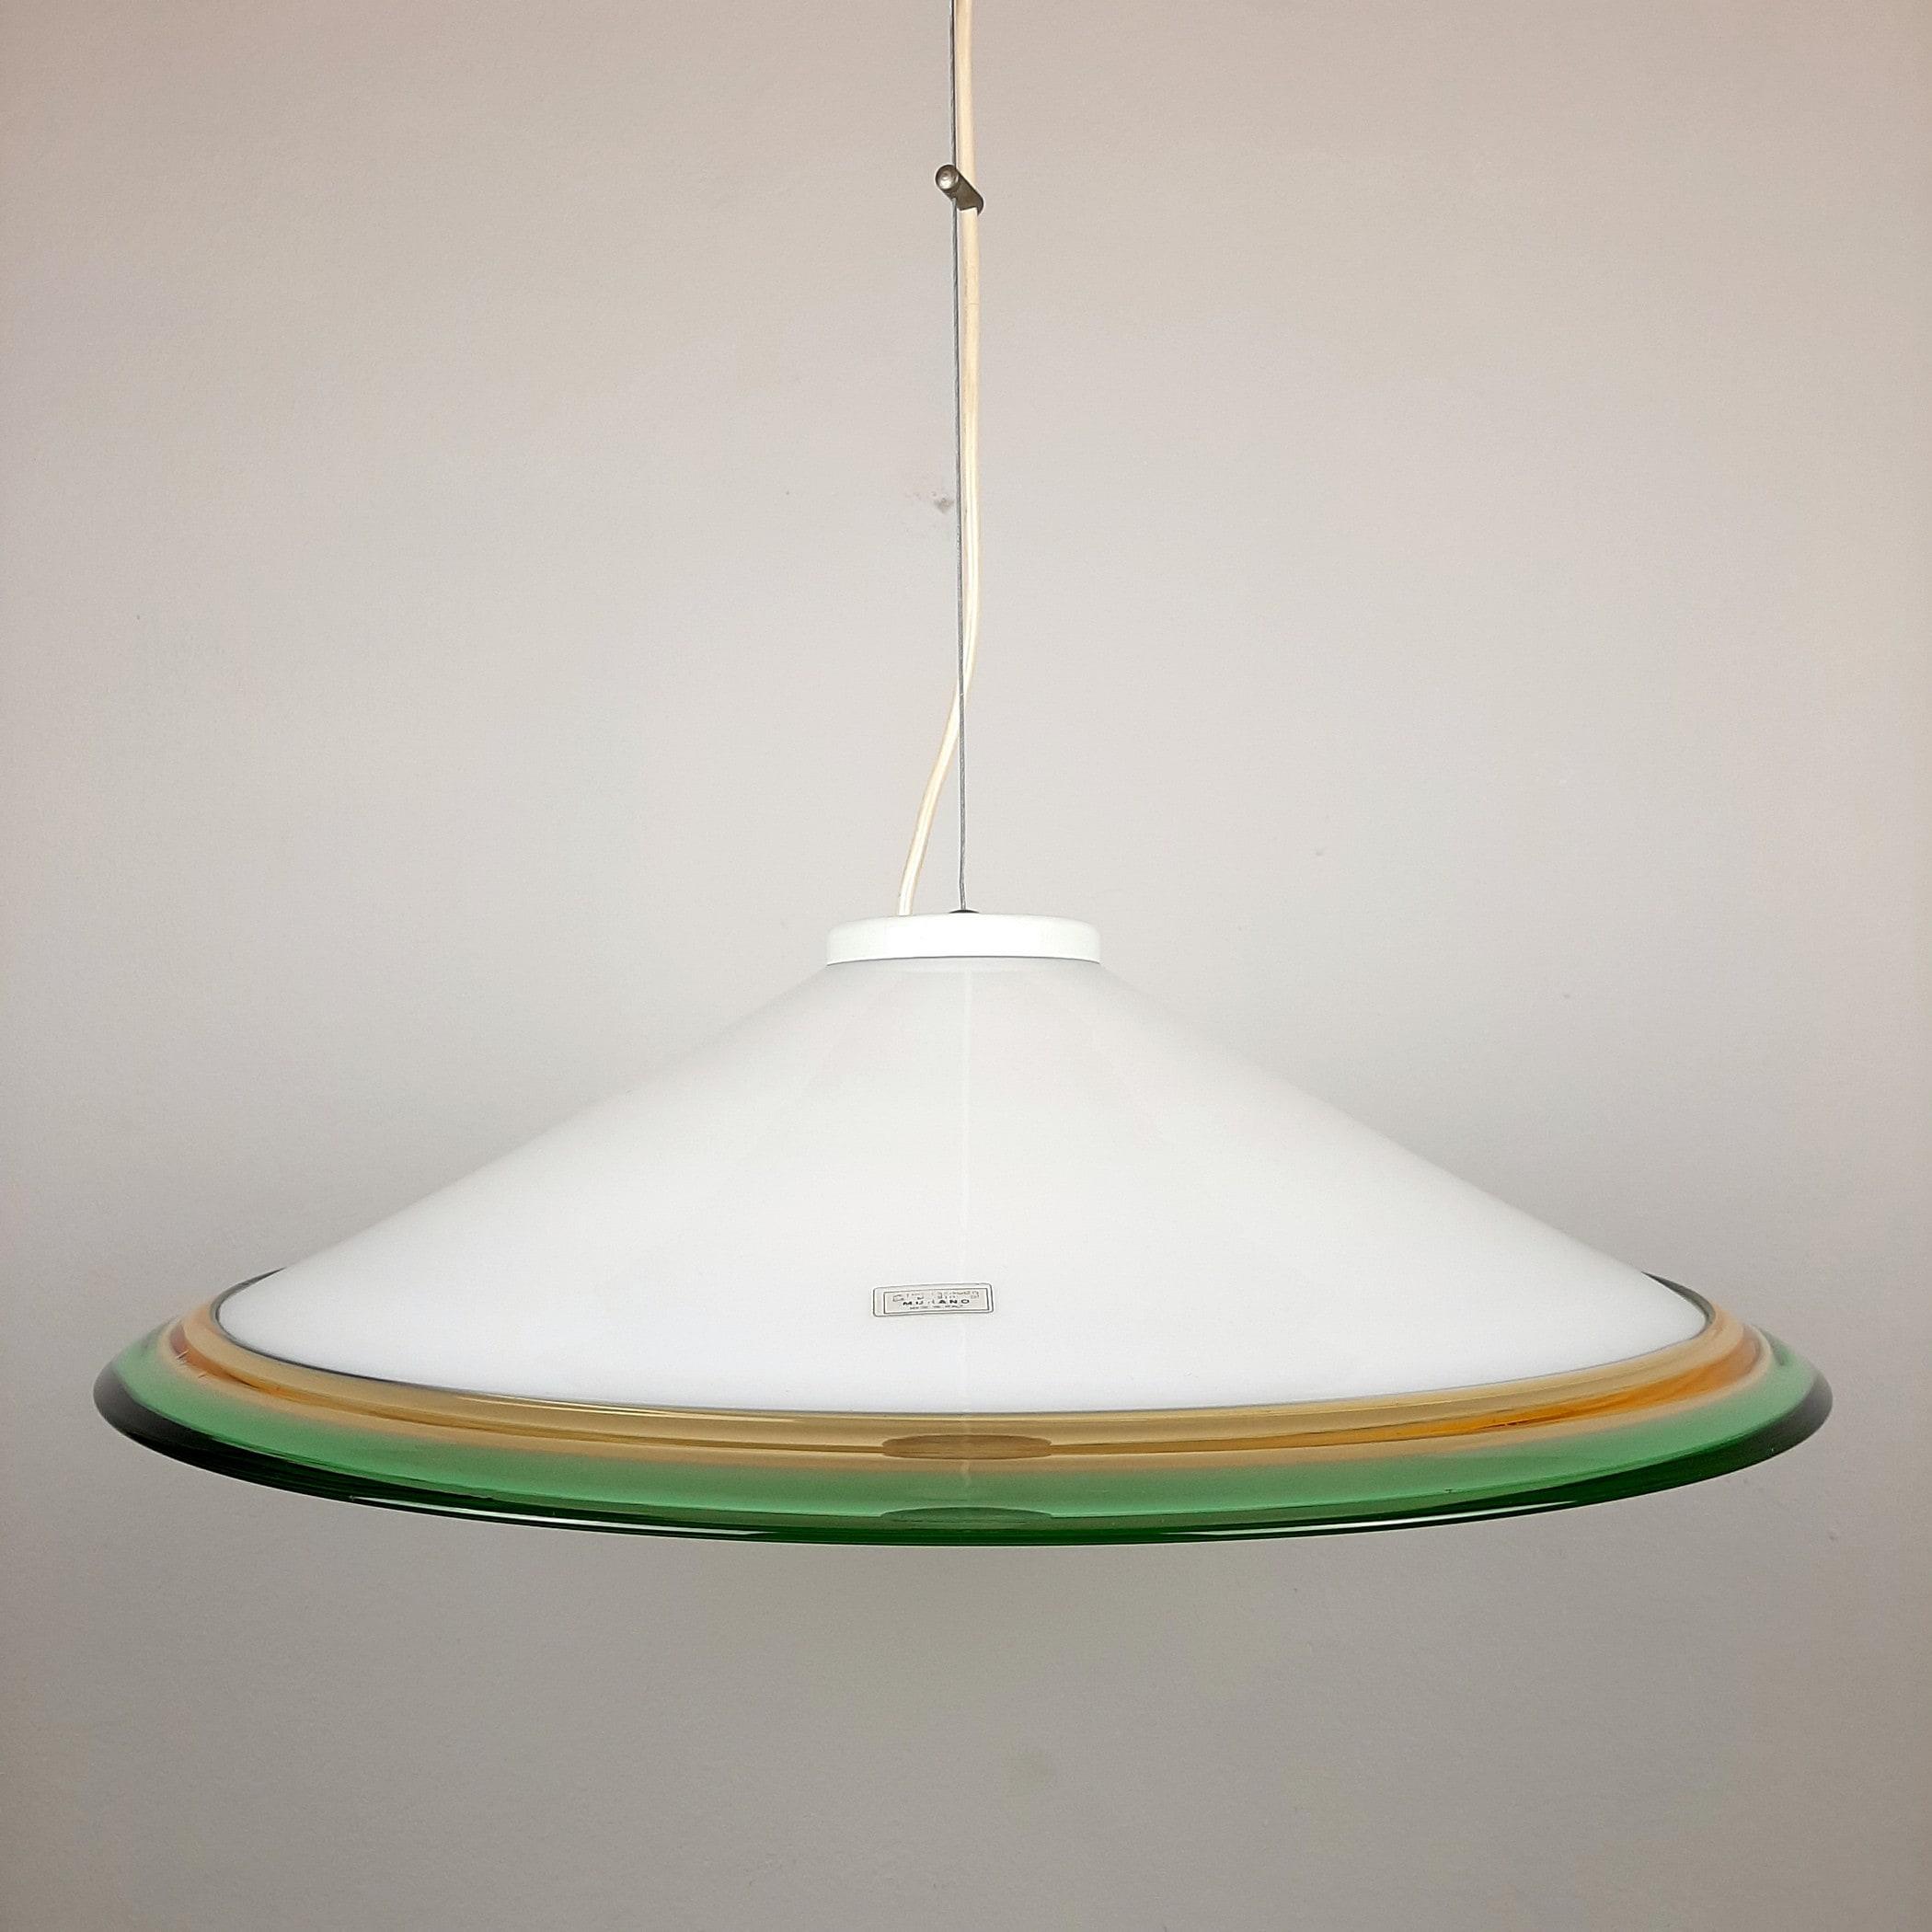 Vintage murano glass pendant lamp Italy 1970s White Green Yellow